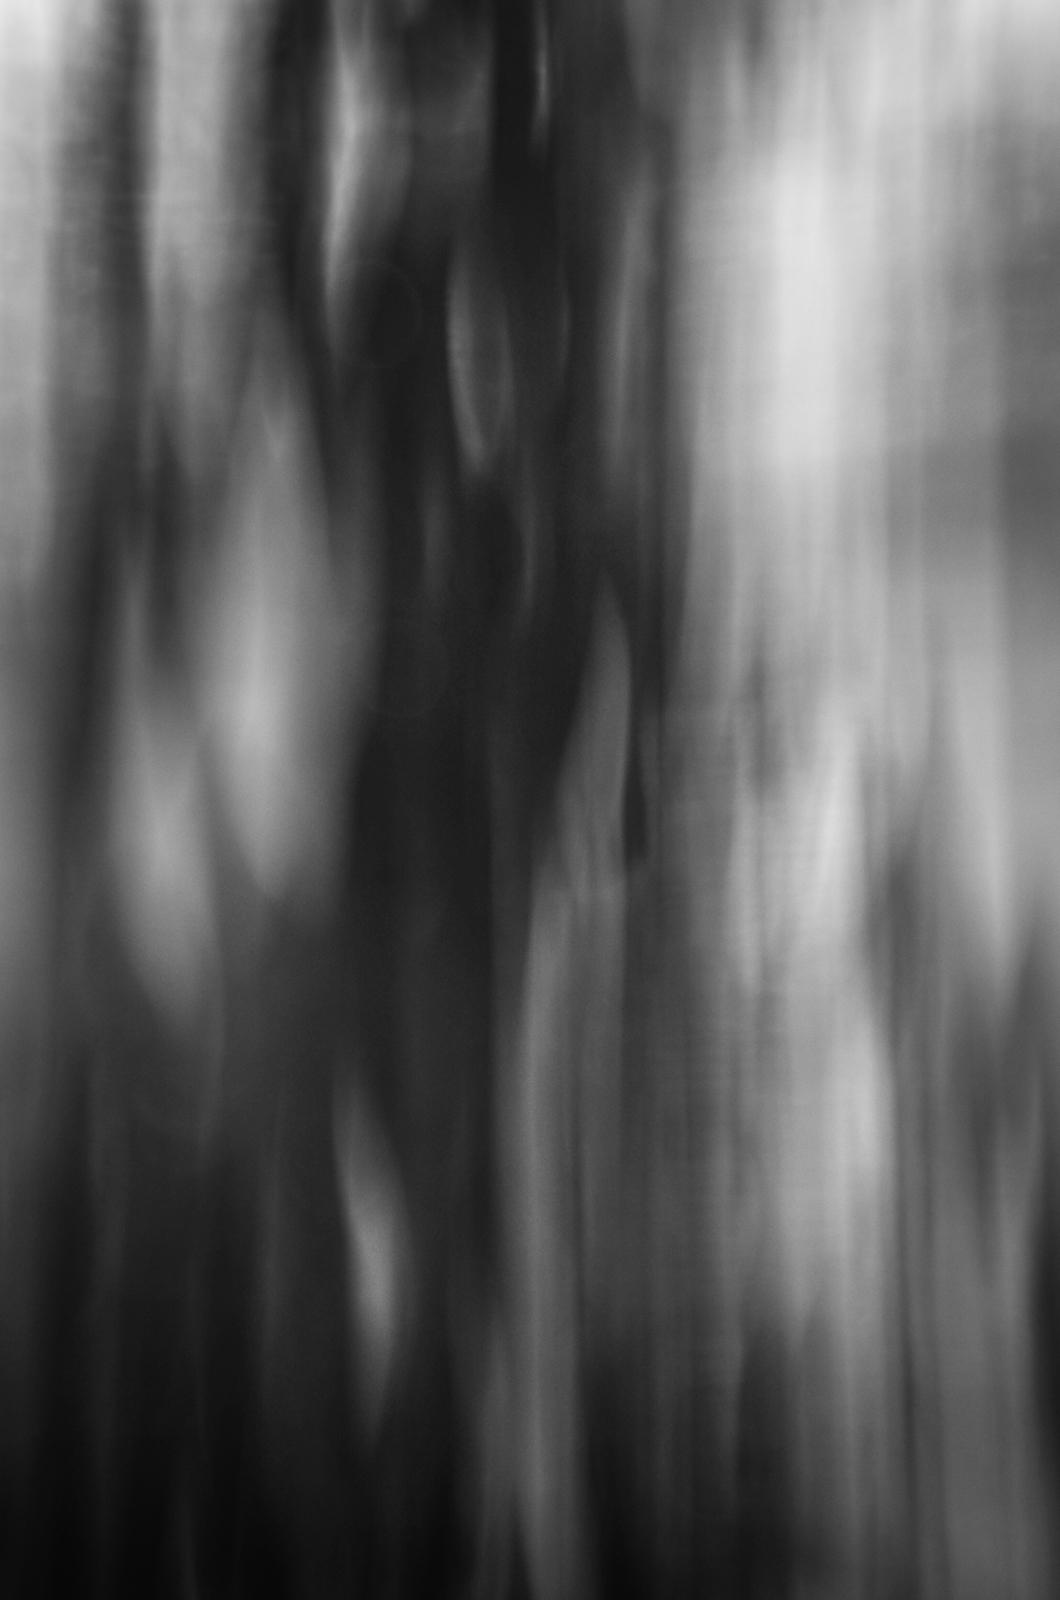 Blurred Lines8©JamesECockroft 20141114